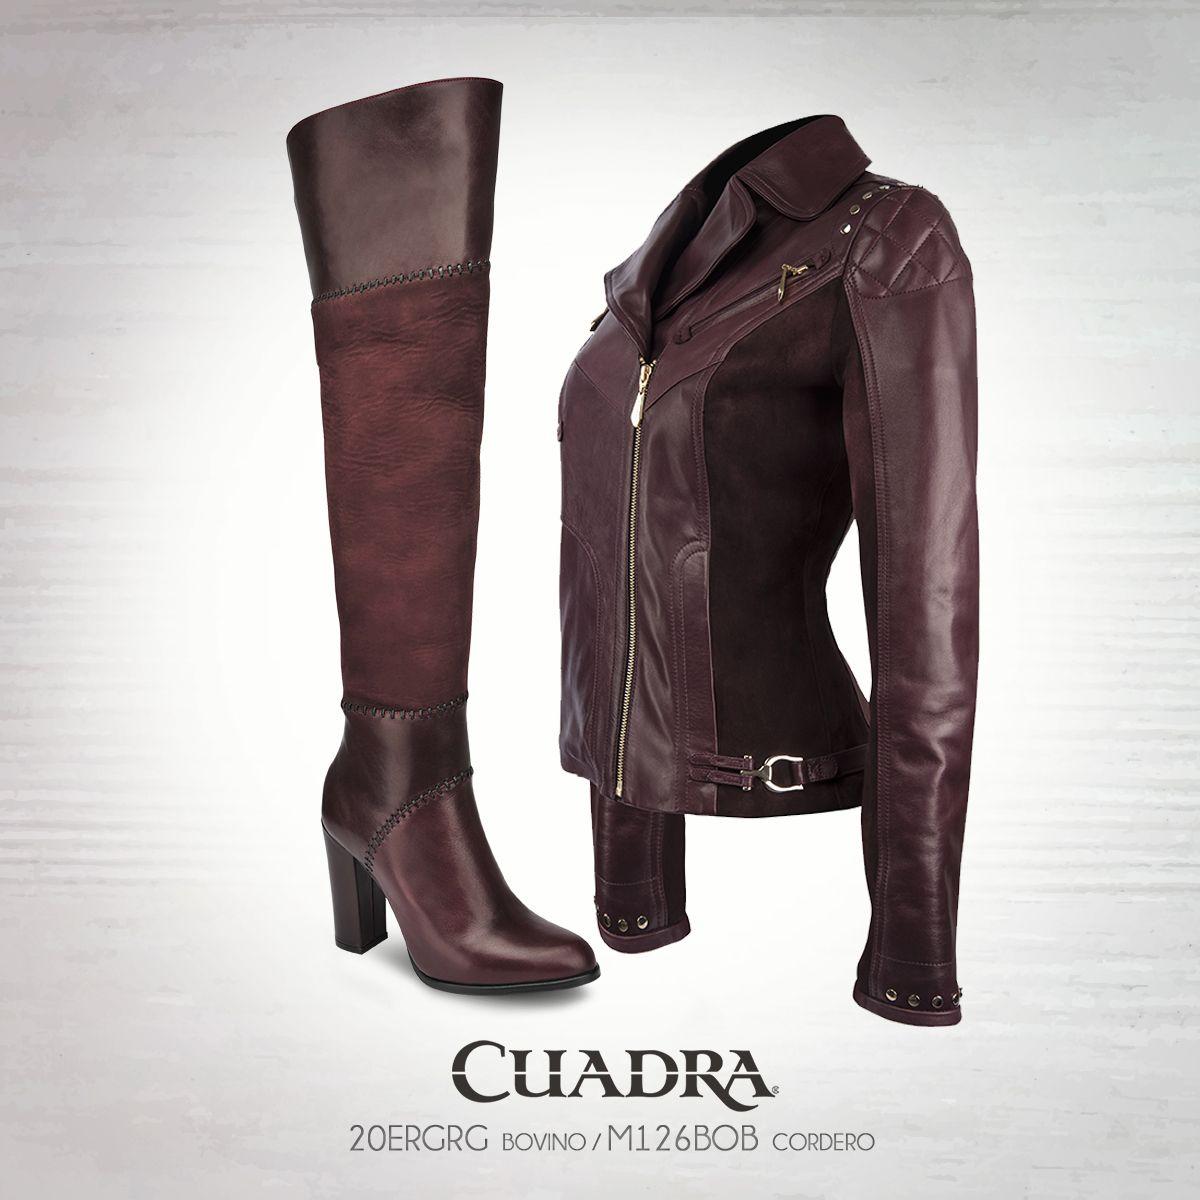 450fd5fa9e3a4 Hechos para estar juntos.  cuadra moda fashion boots  chamarra leatherjacket leather tinto bota dama